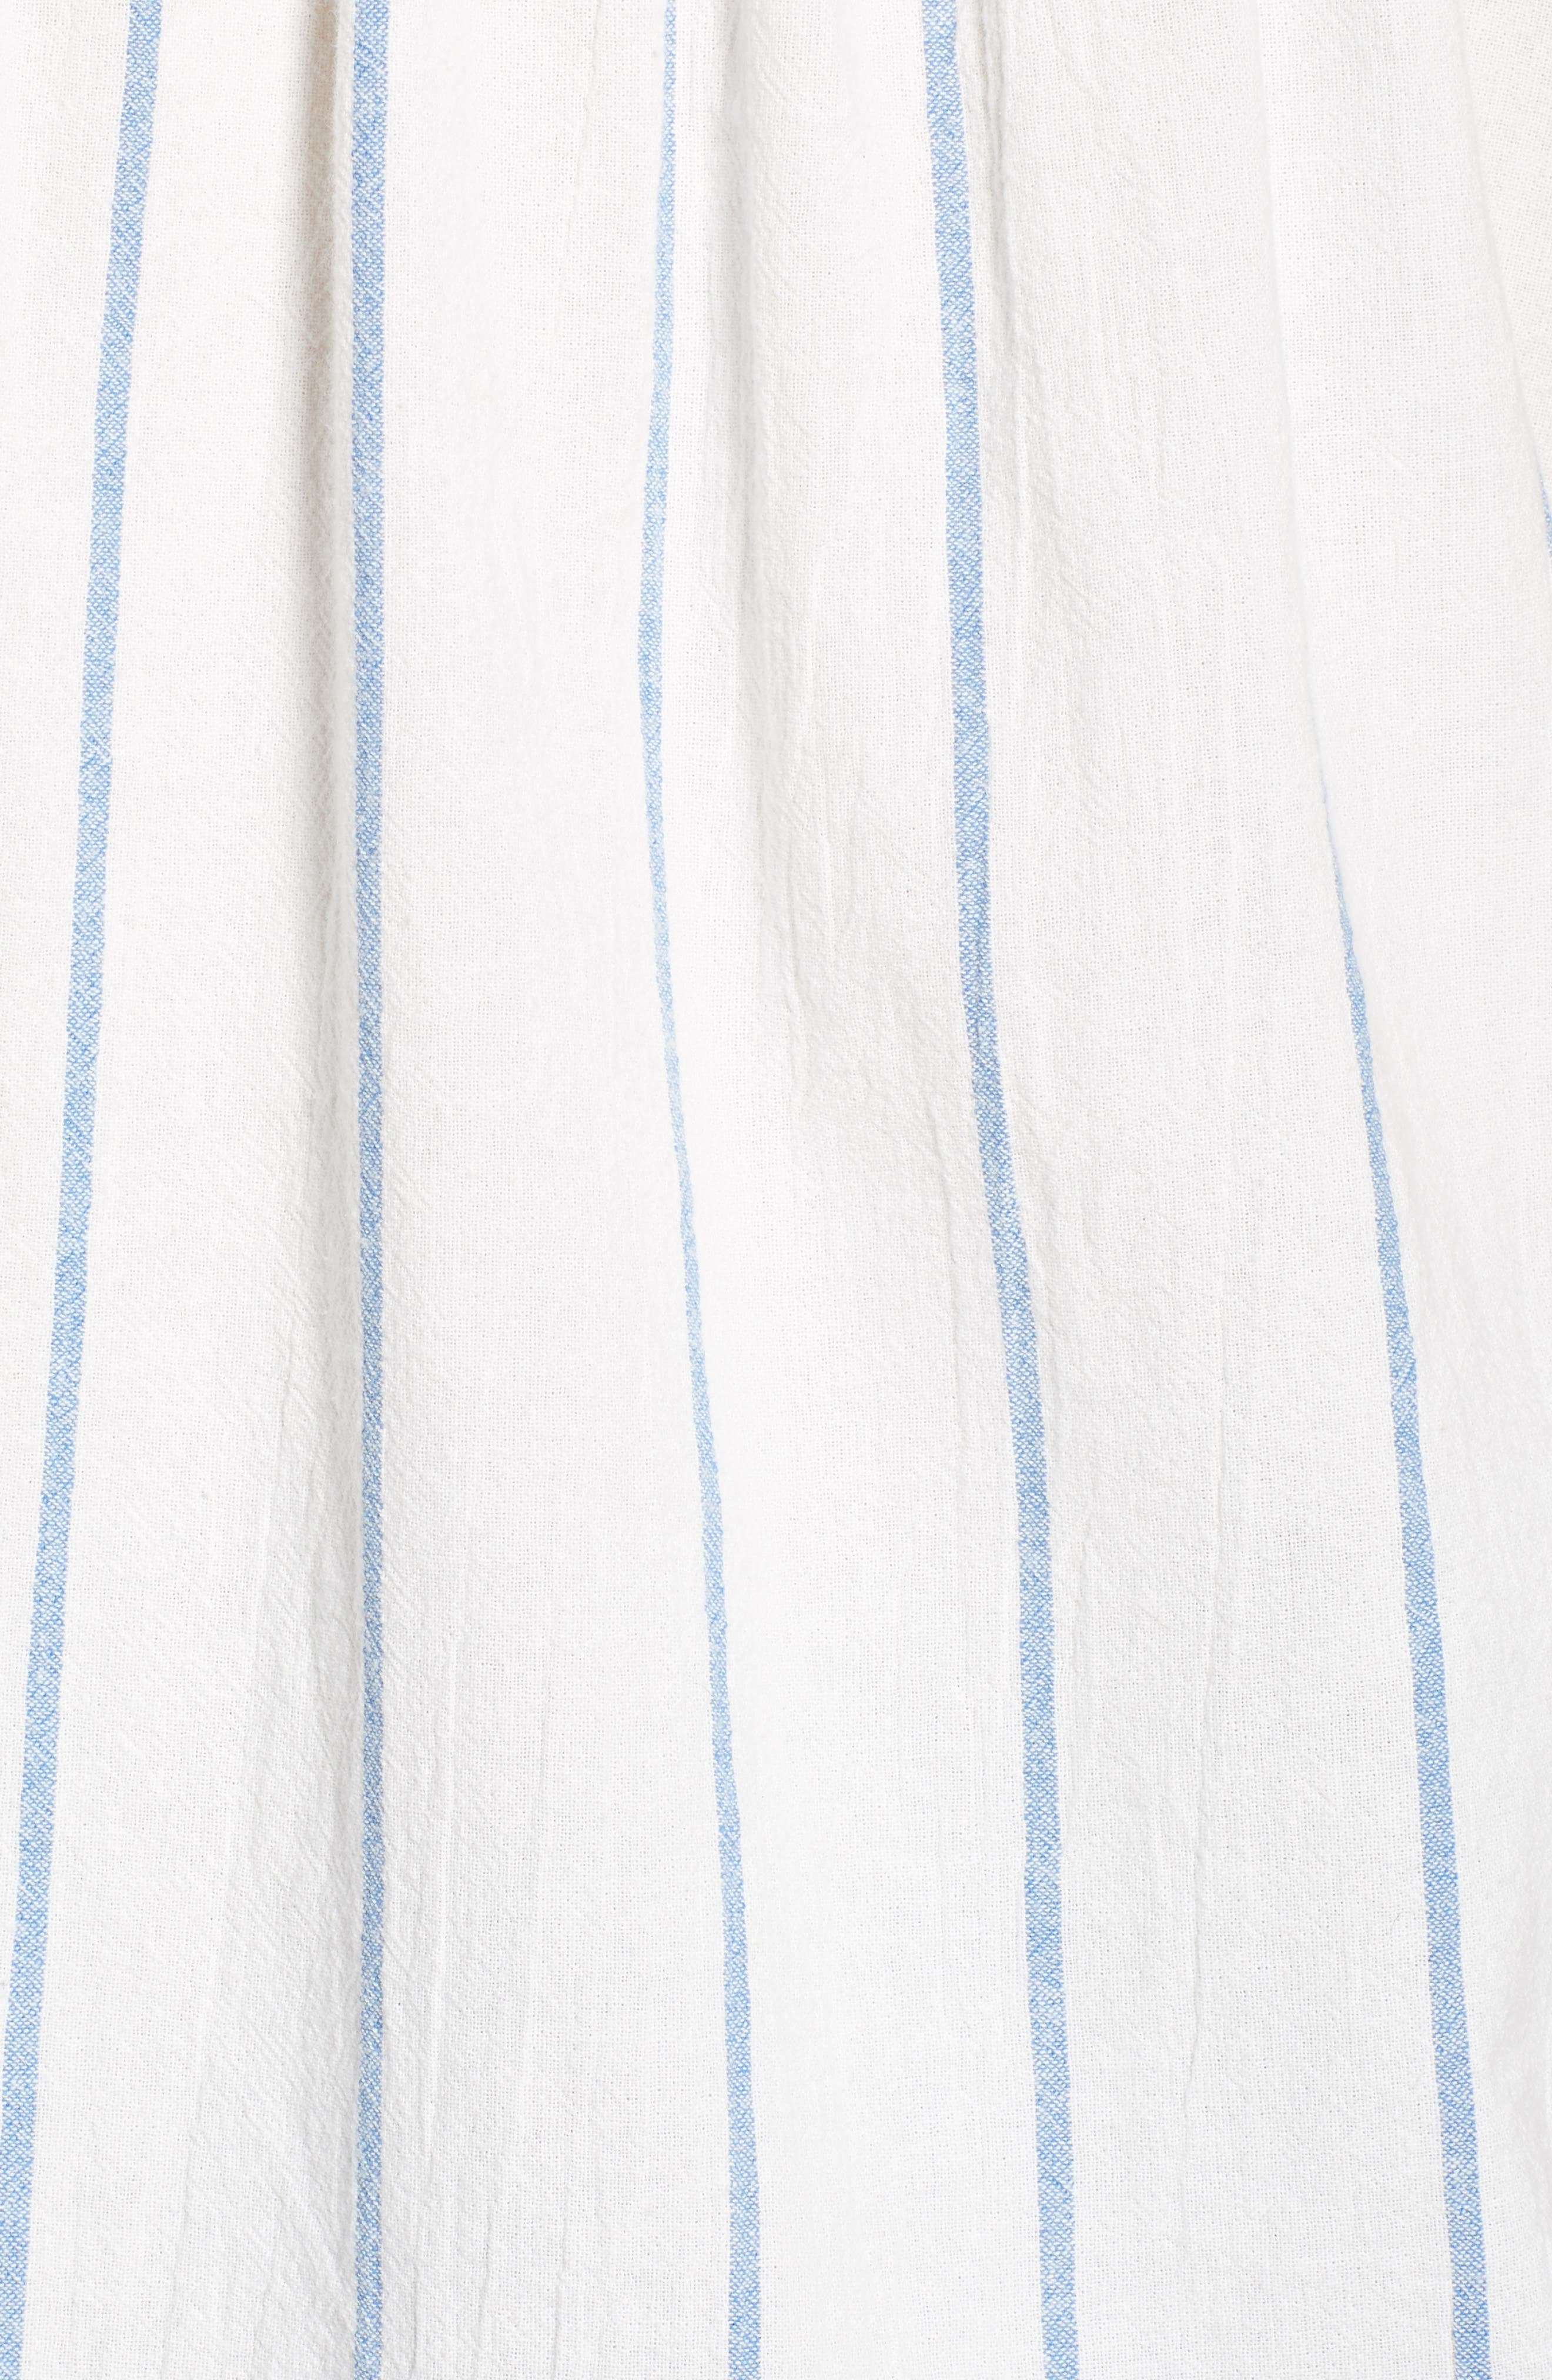 Stripe Cap Sleeve Top,                             Alternate thumbnail 5, color,                             900